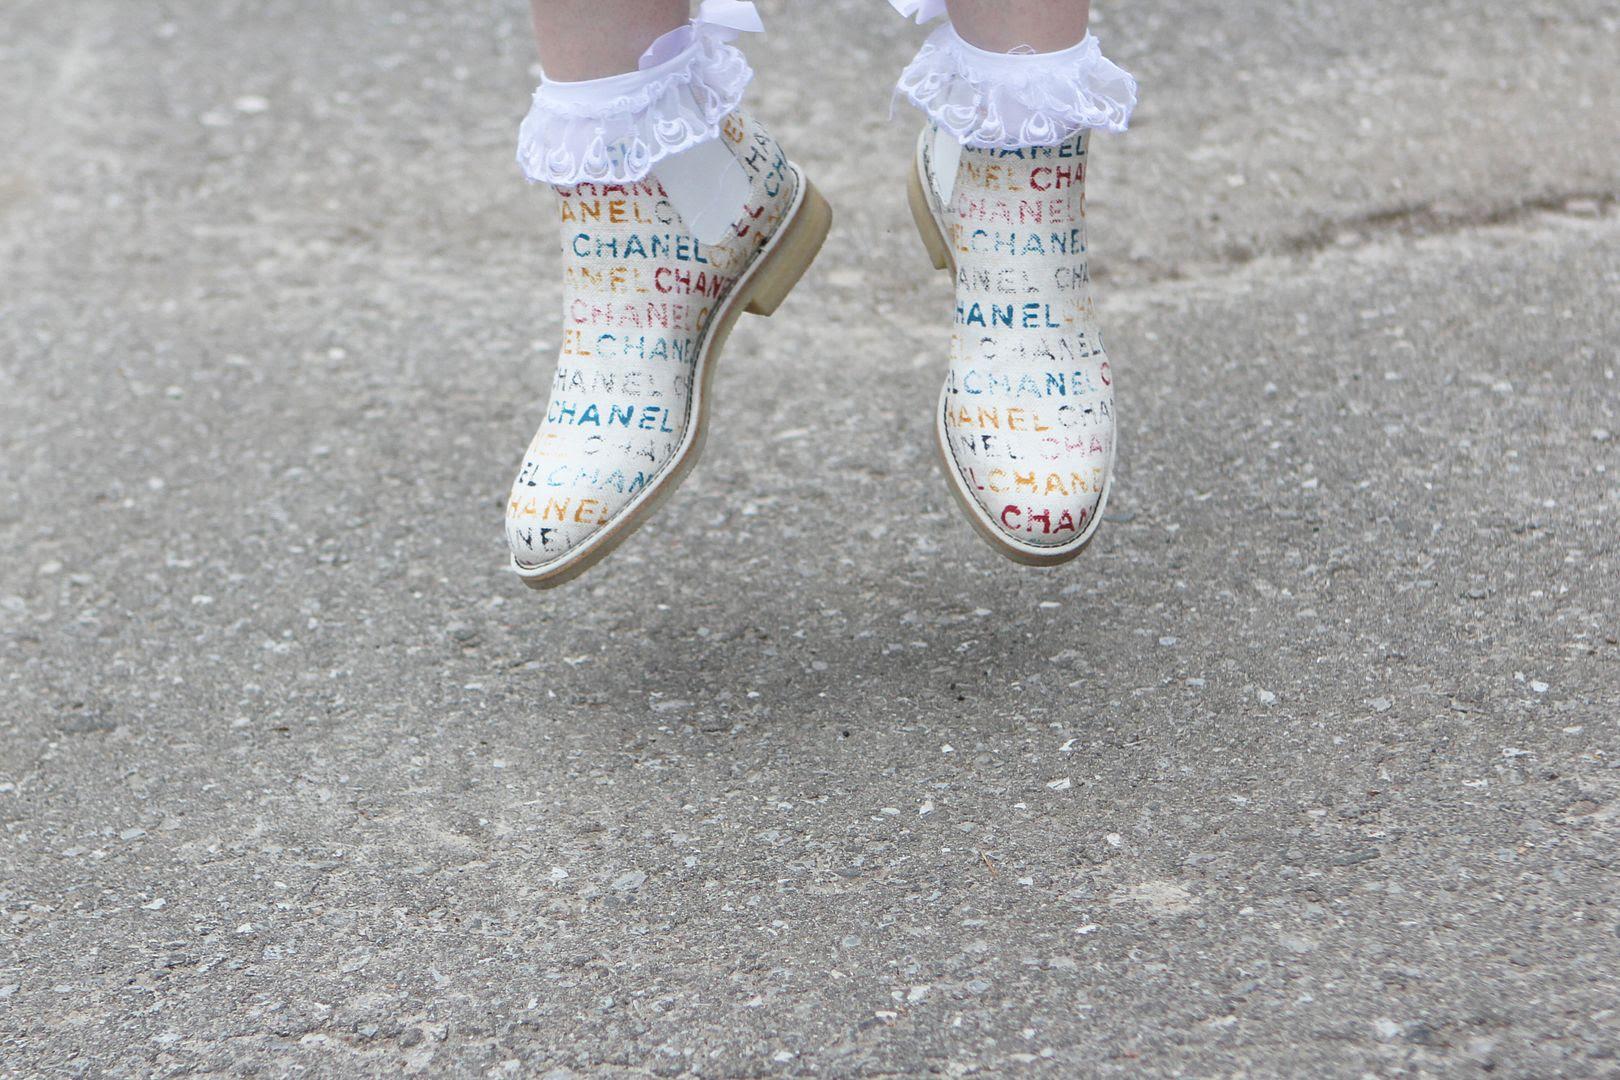 photo chanelshoes-rufflesocks-torontoblog-beckermanblog_zps354ff37b.jpg